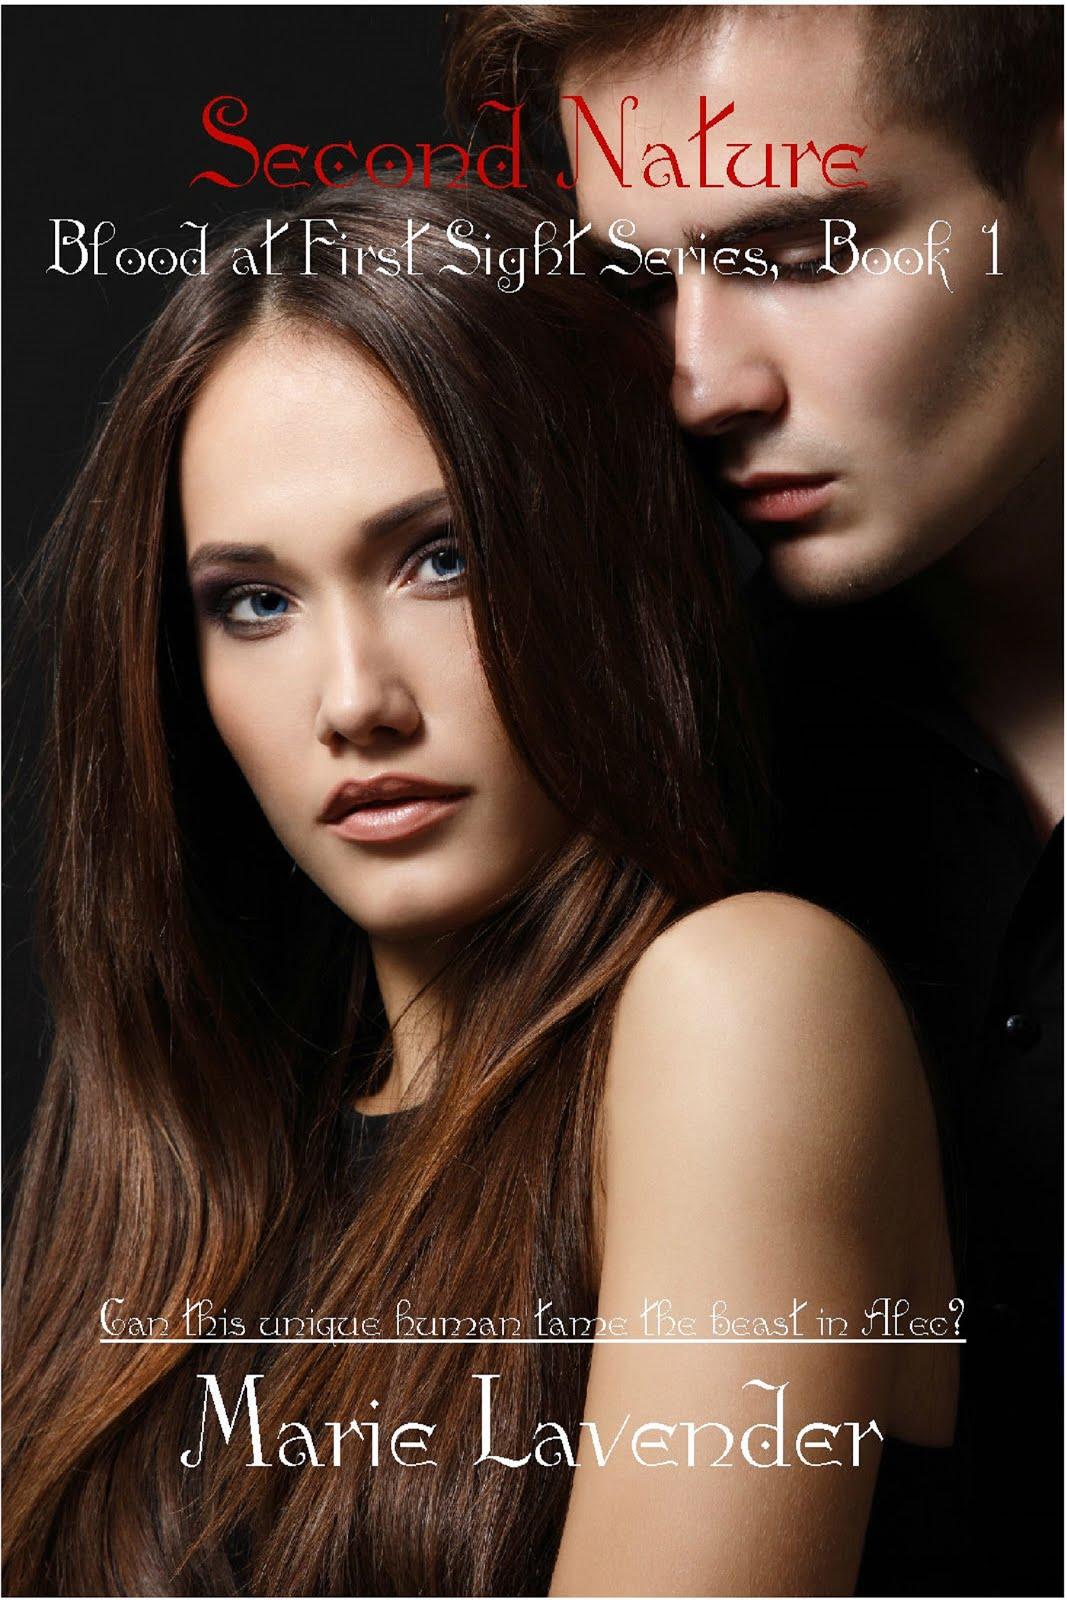 Released December 2014